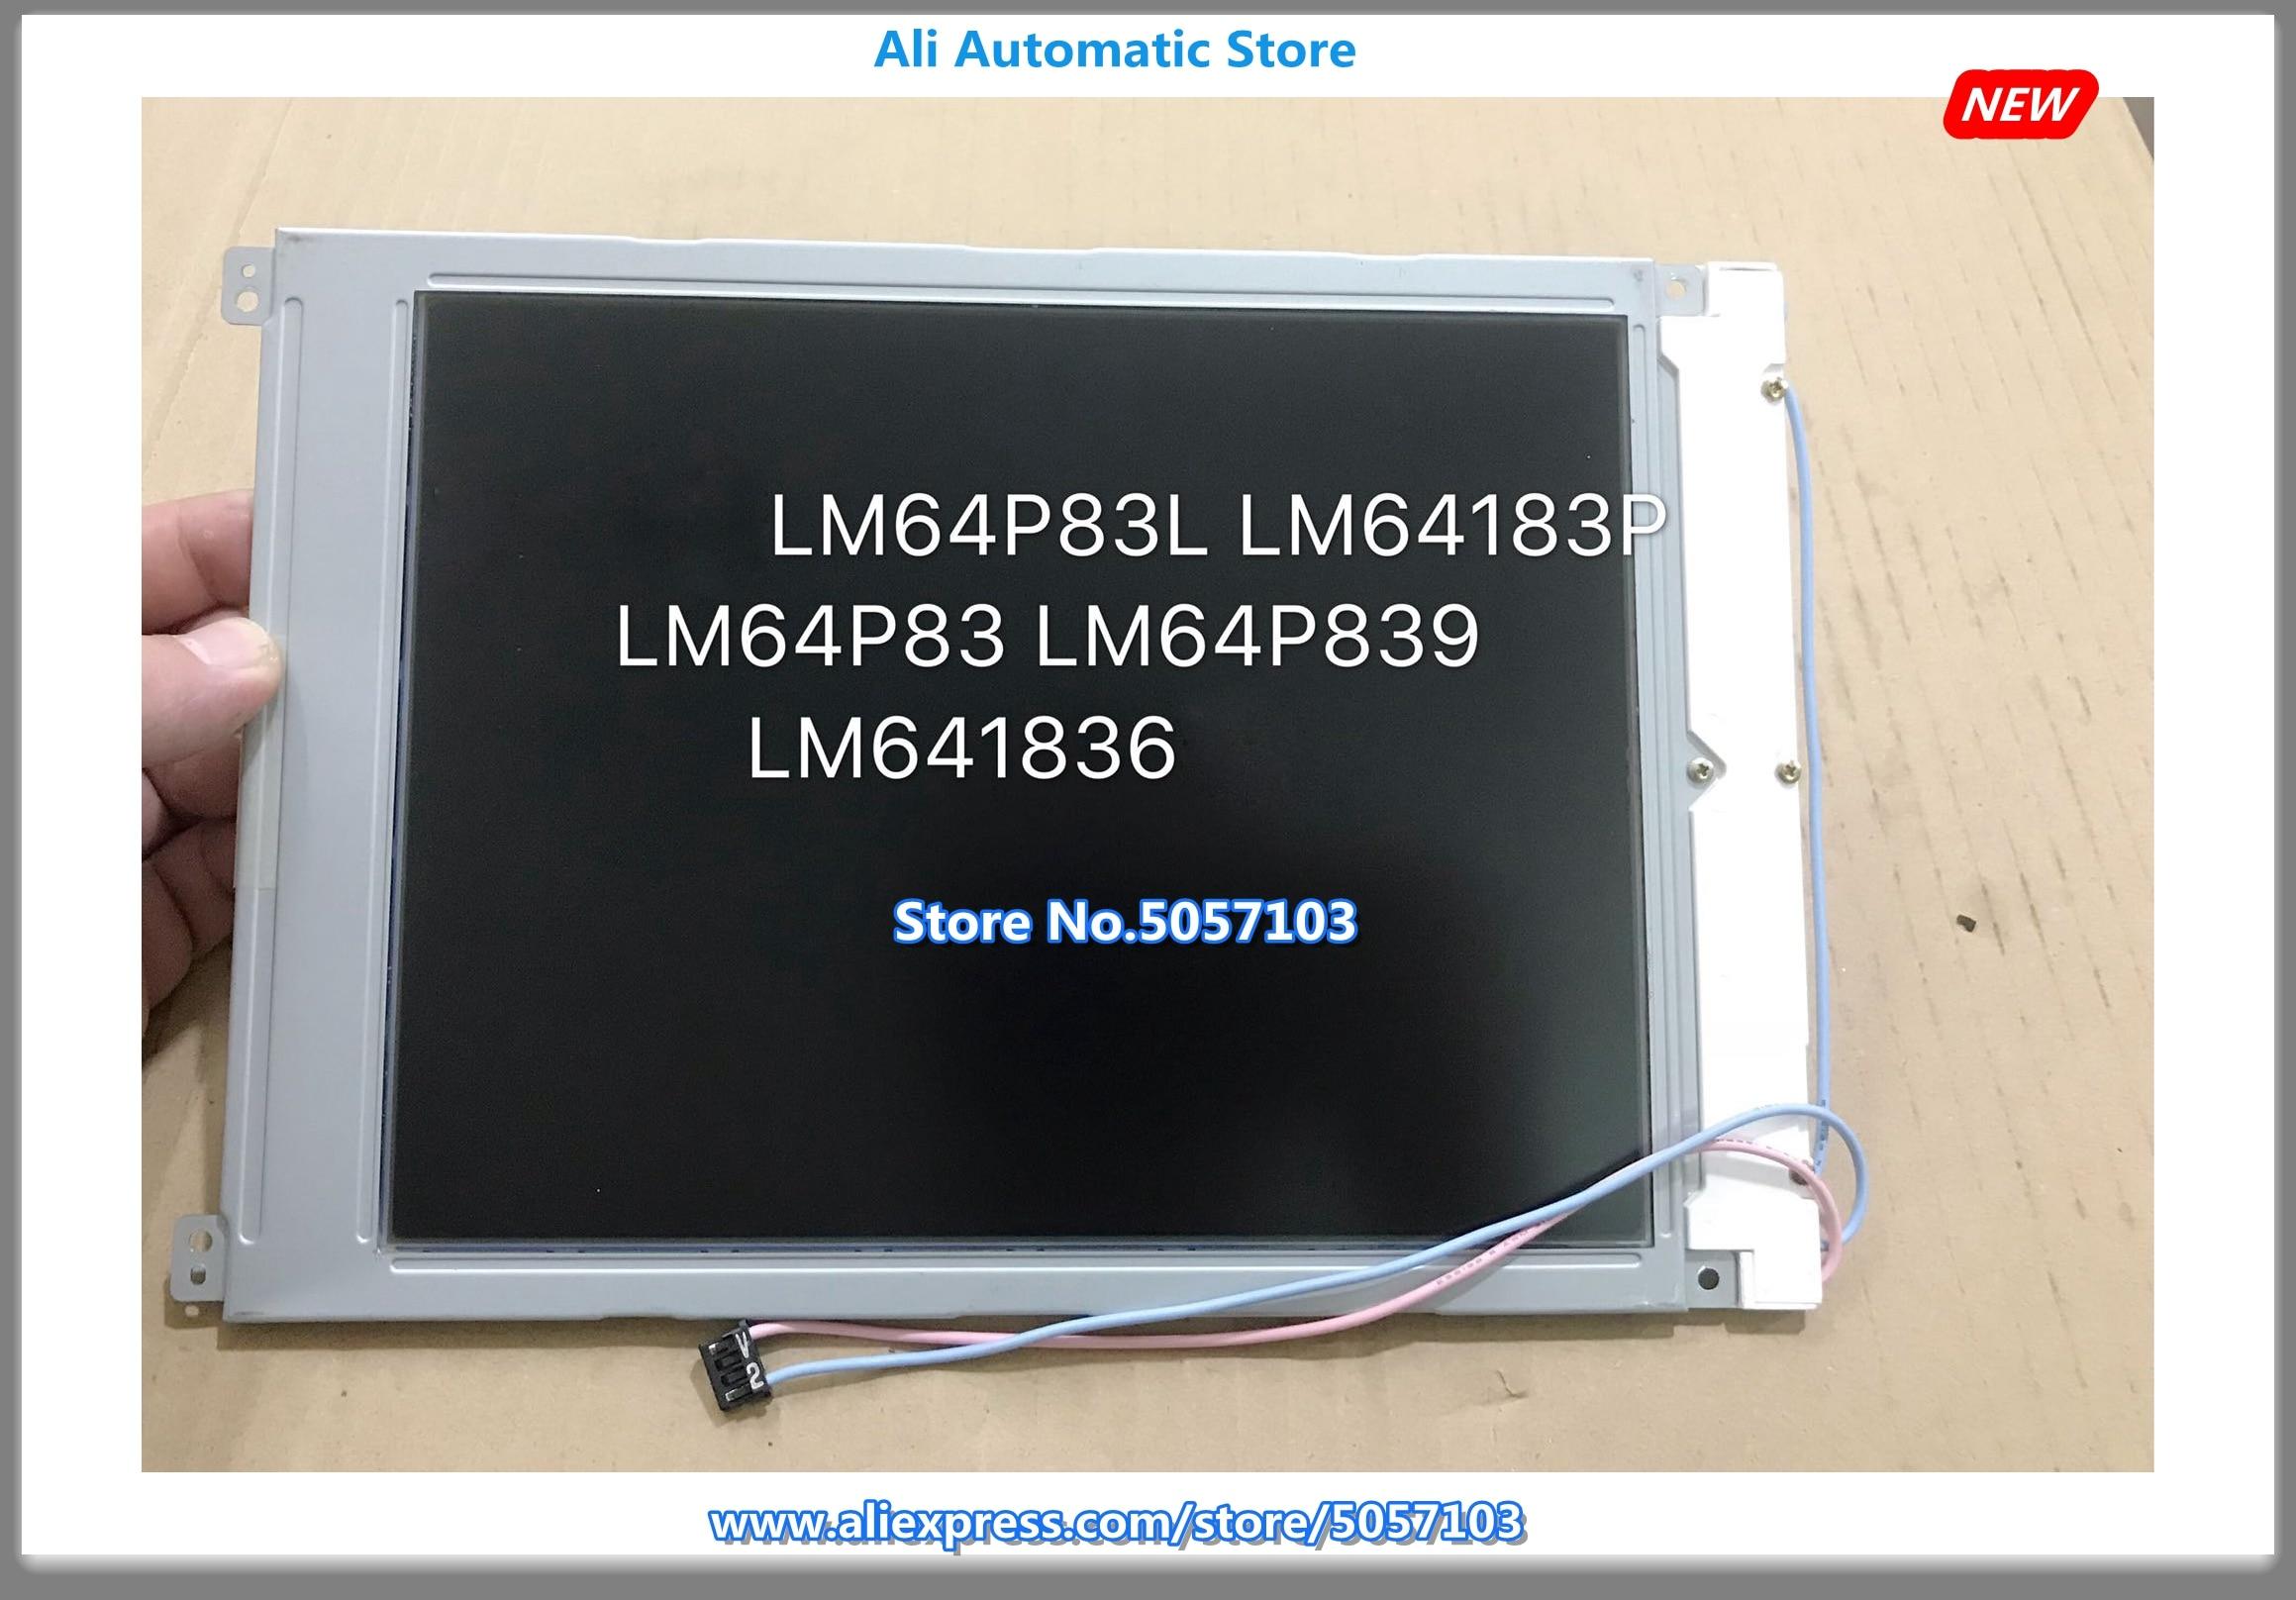 Original LM64P83L LM64183P LM64P83 LM64P839 LM641836 Tela LCD